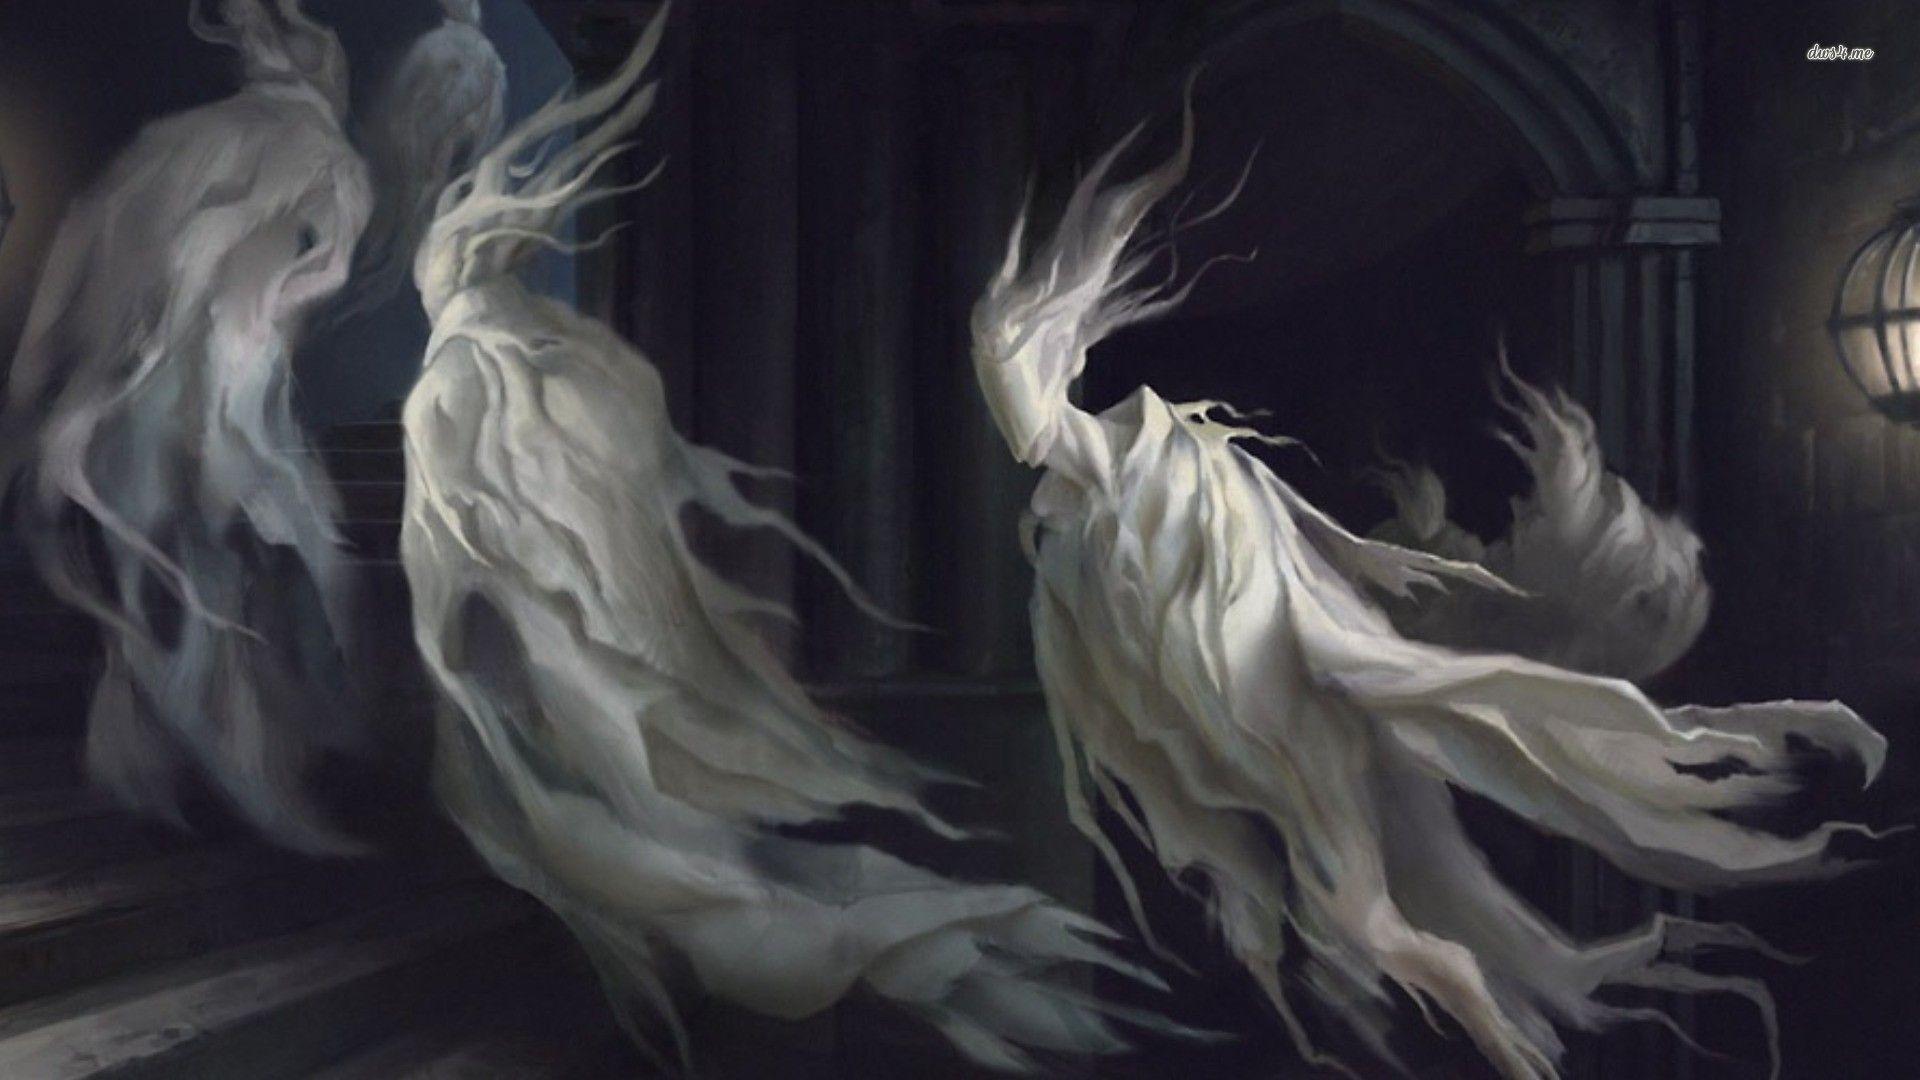 Real people. Real fun. | Ghost images, Ghost, Dark wallpaper